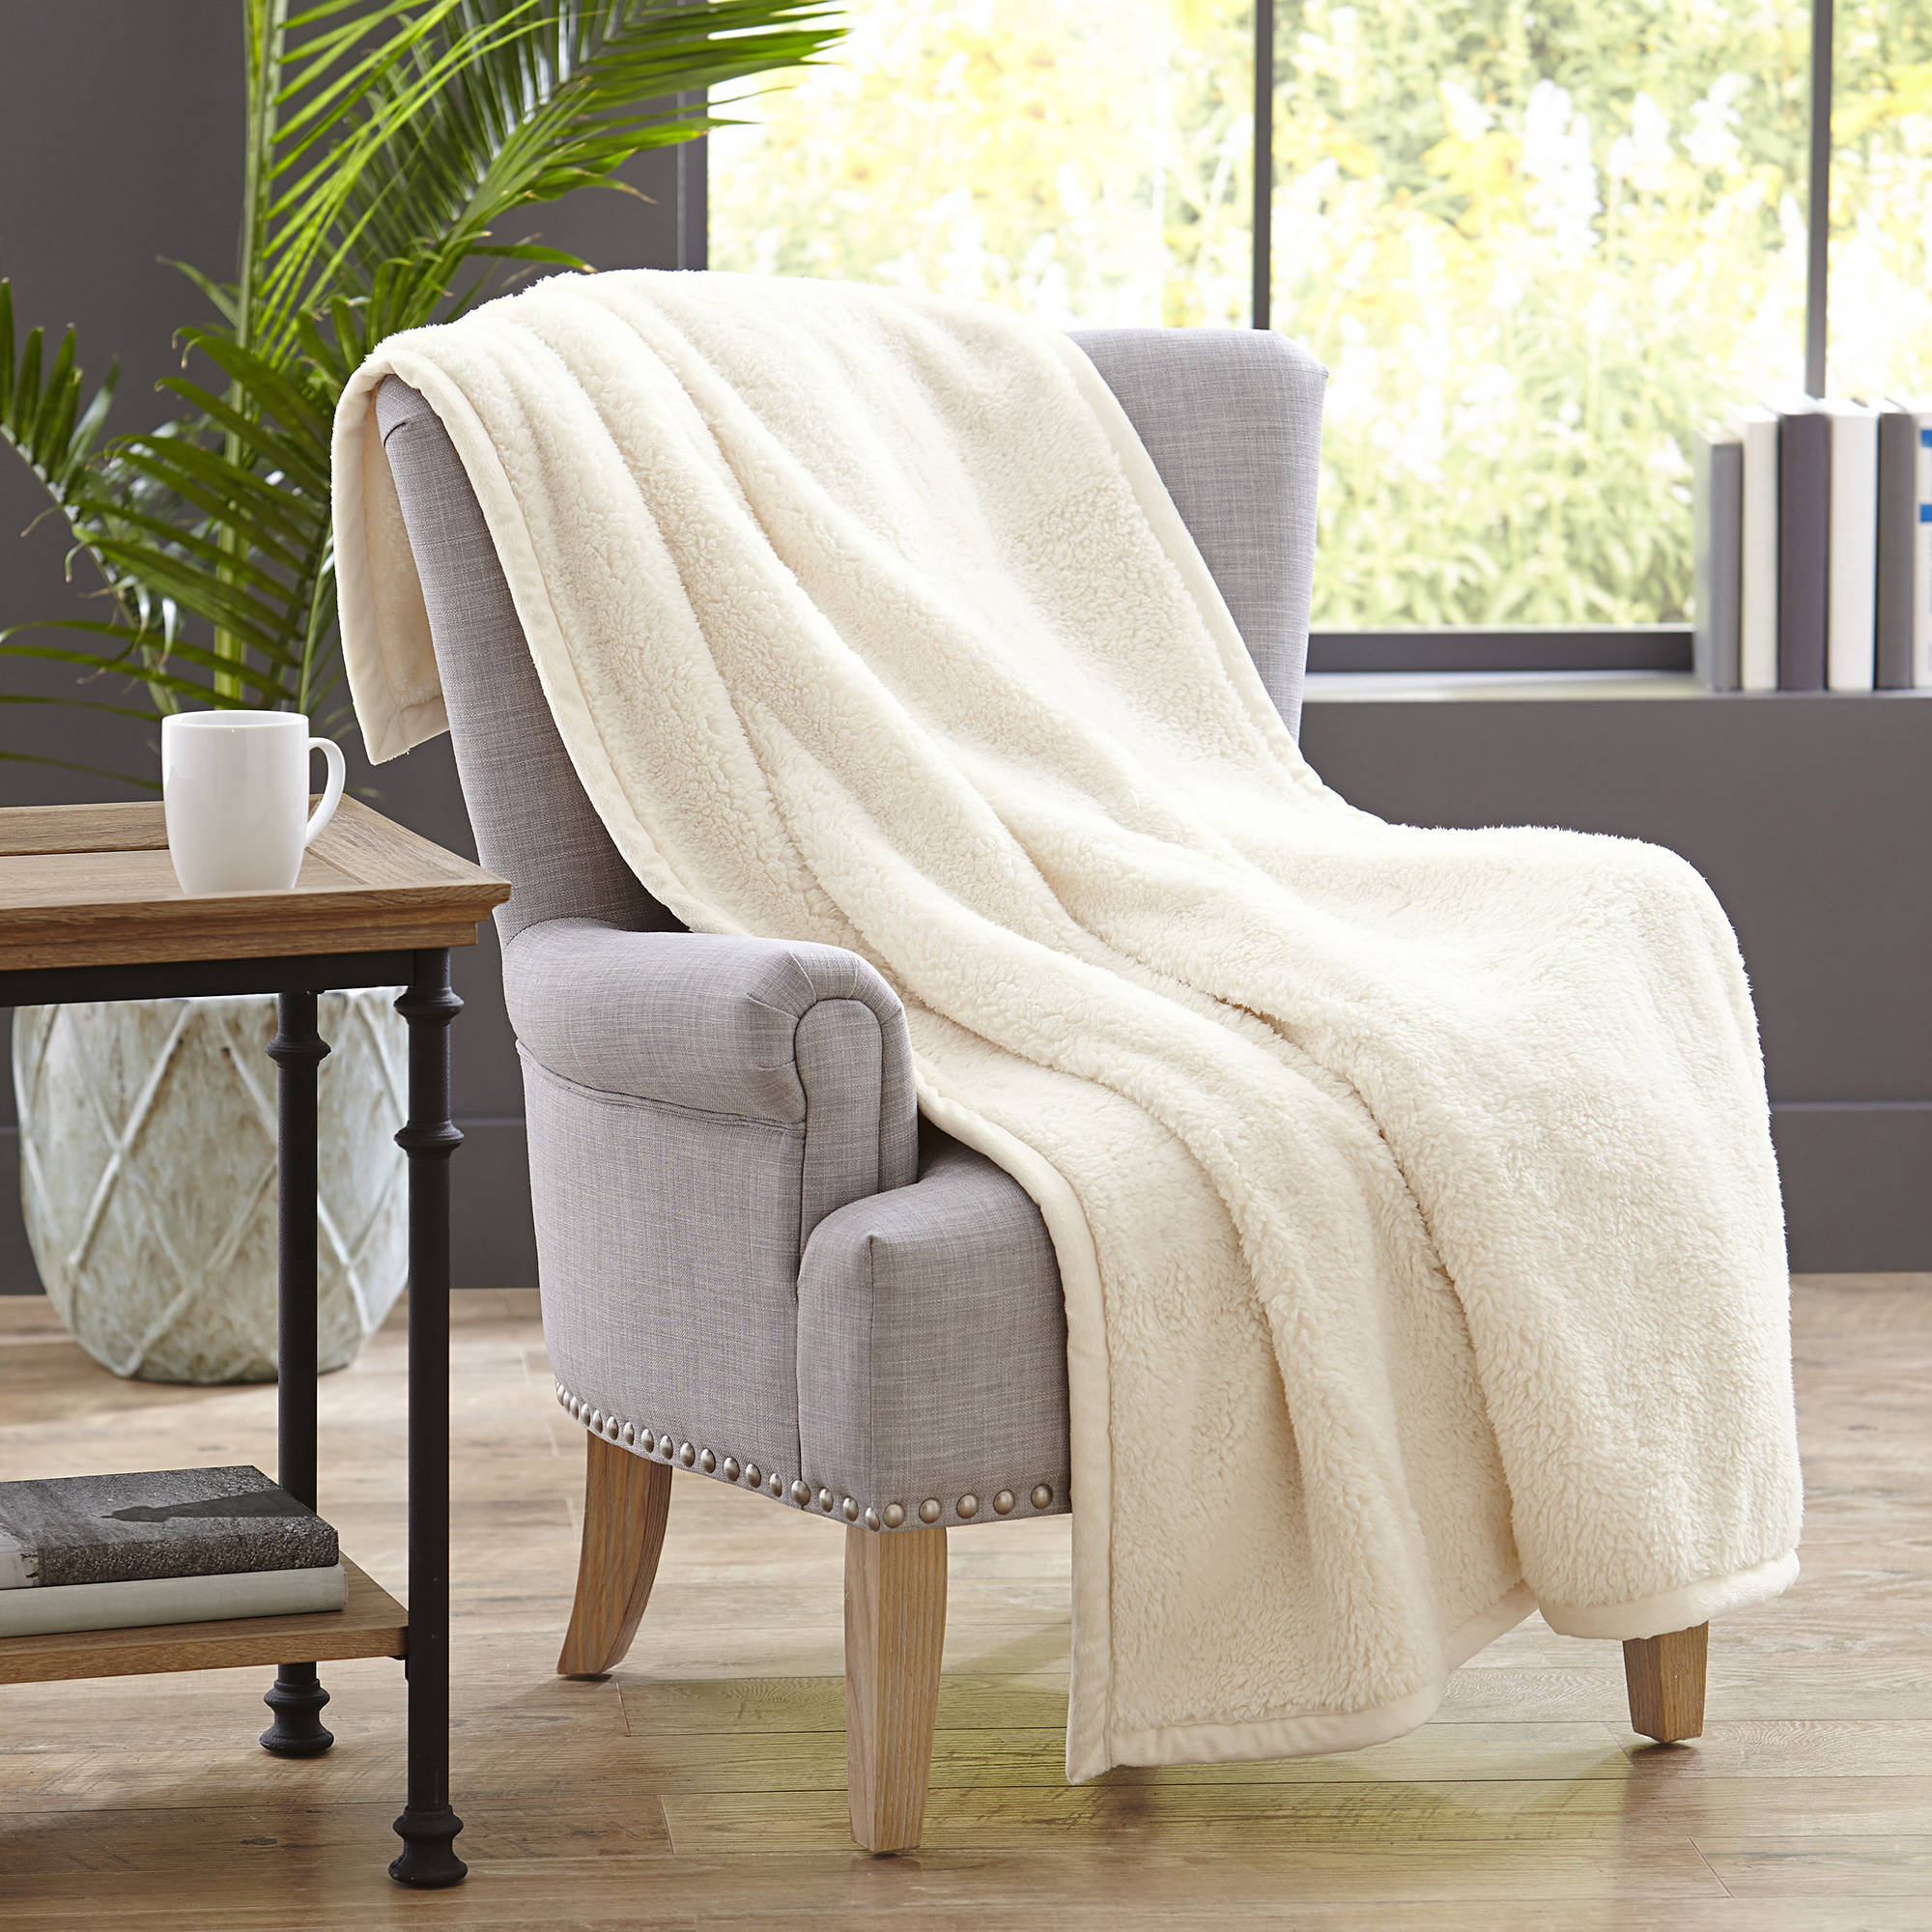 Better Homes & Gardens Sherpa Throw Blanket, 1 Each